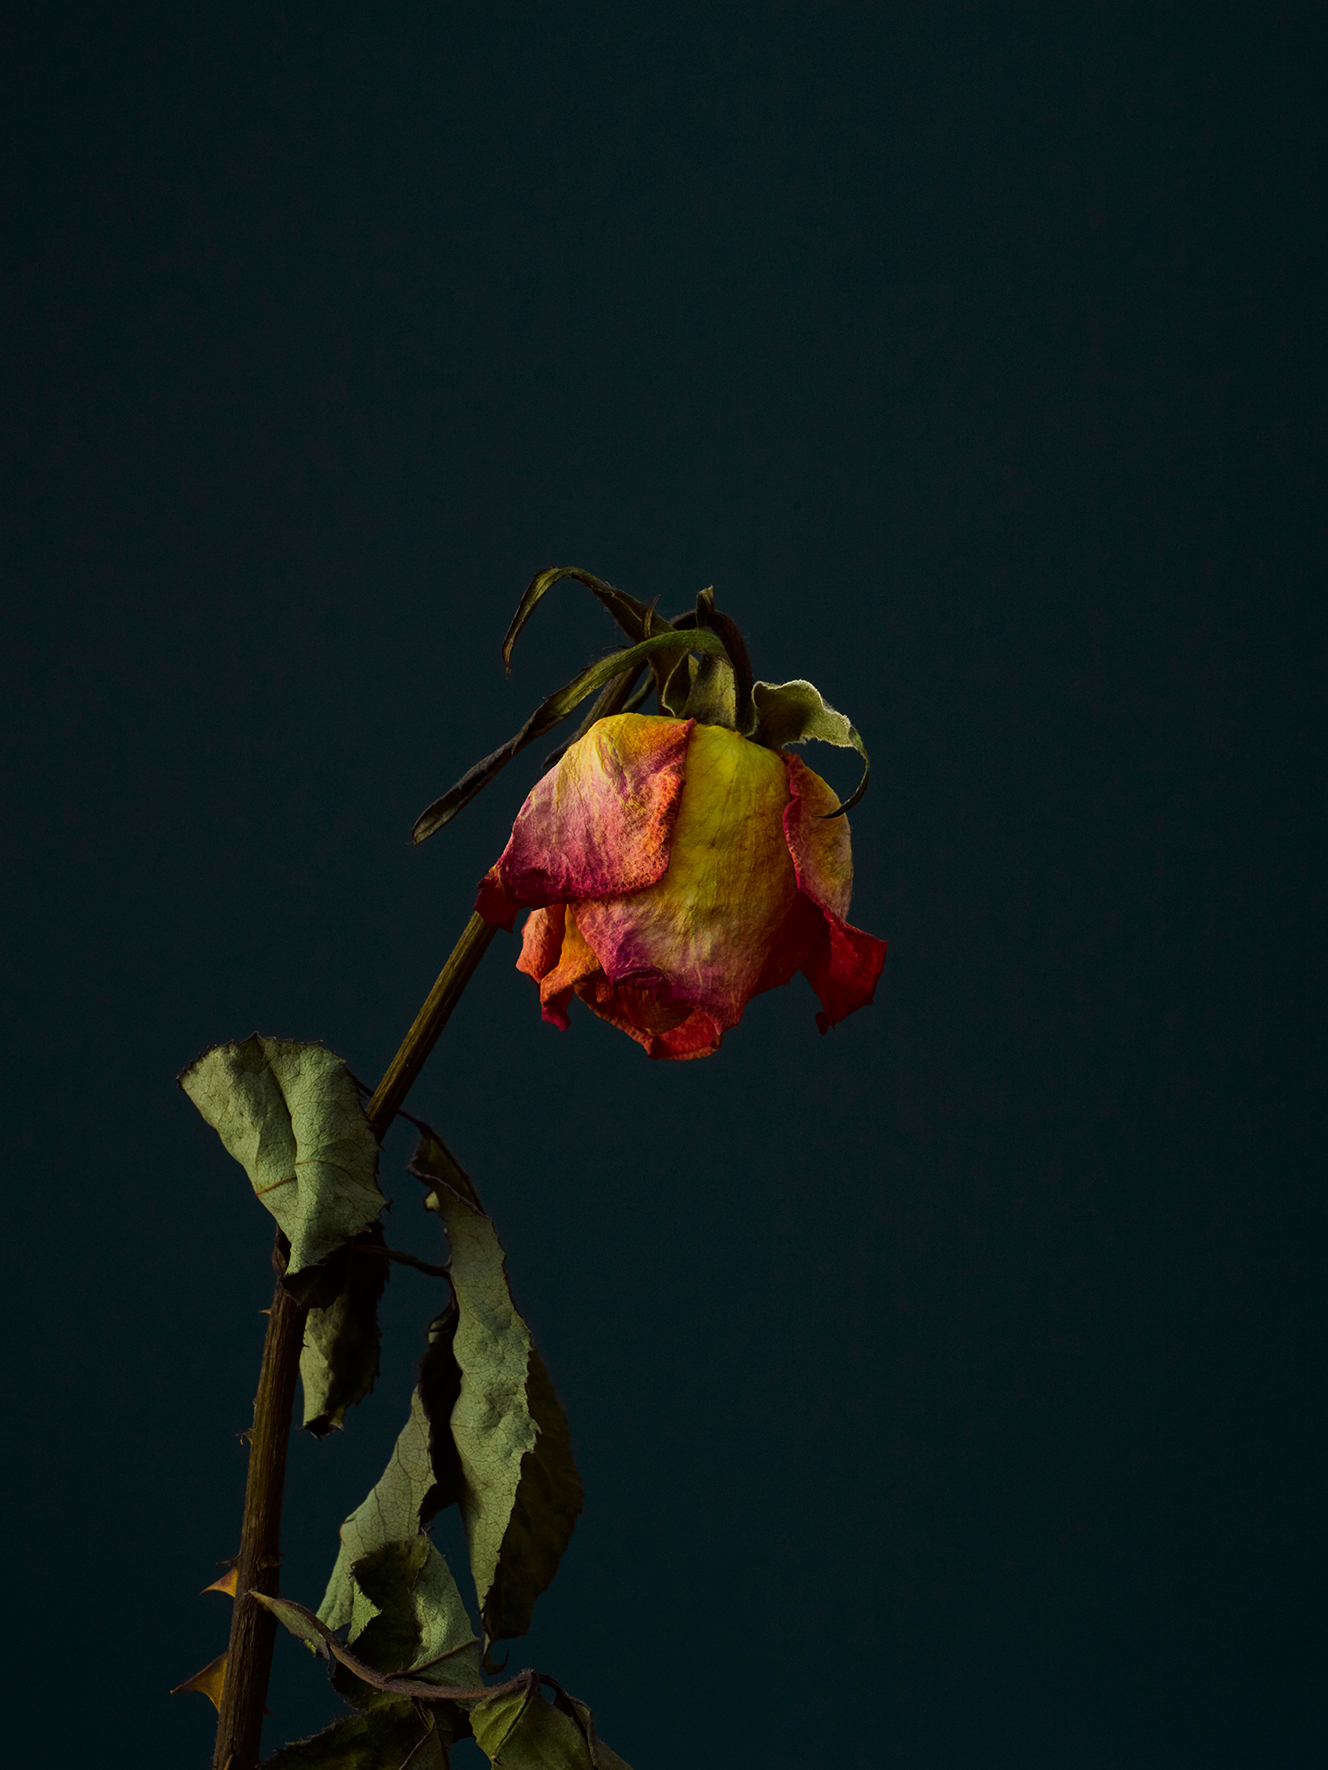 rose-10-copy.jpg